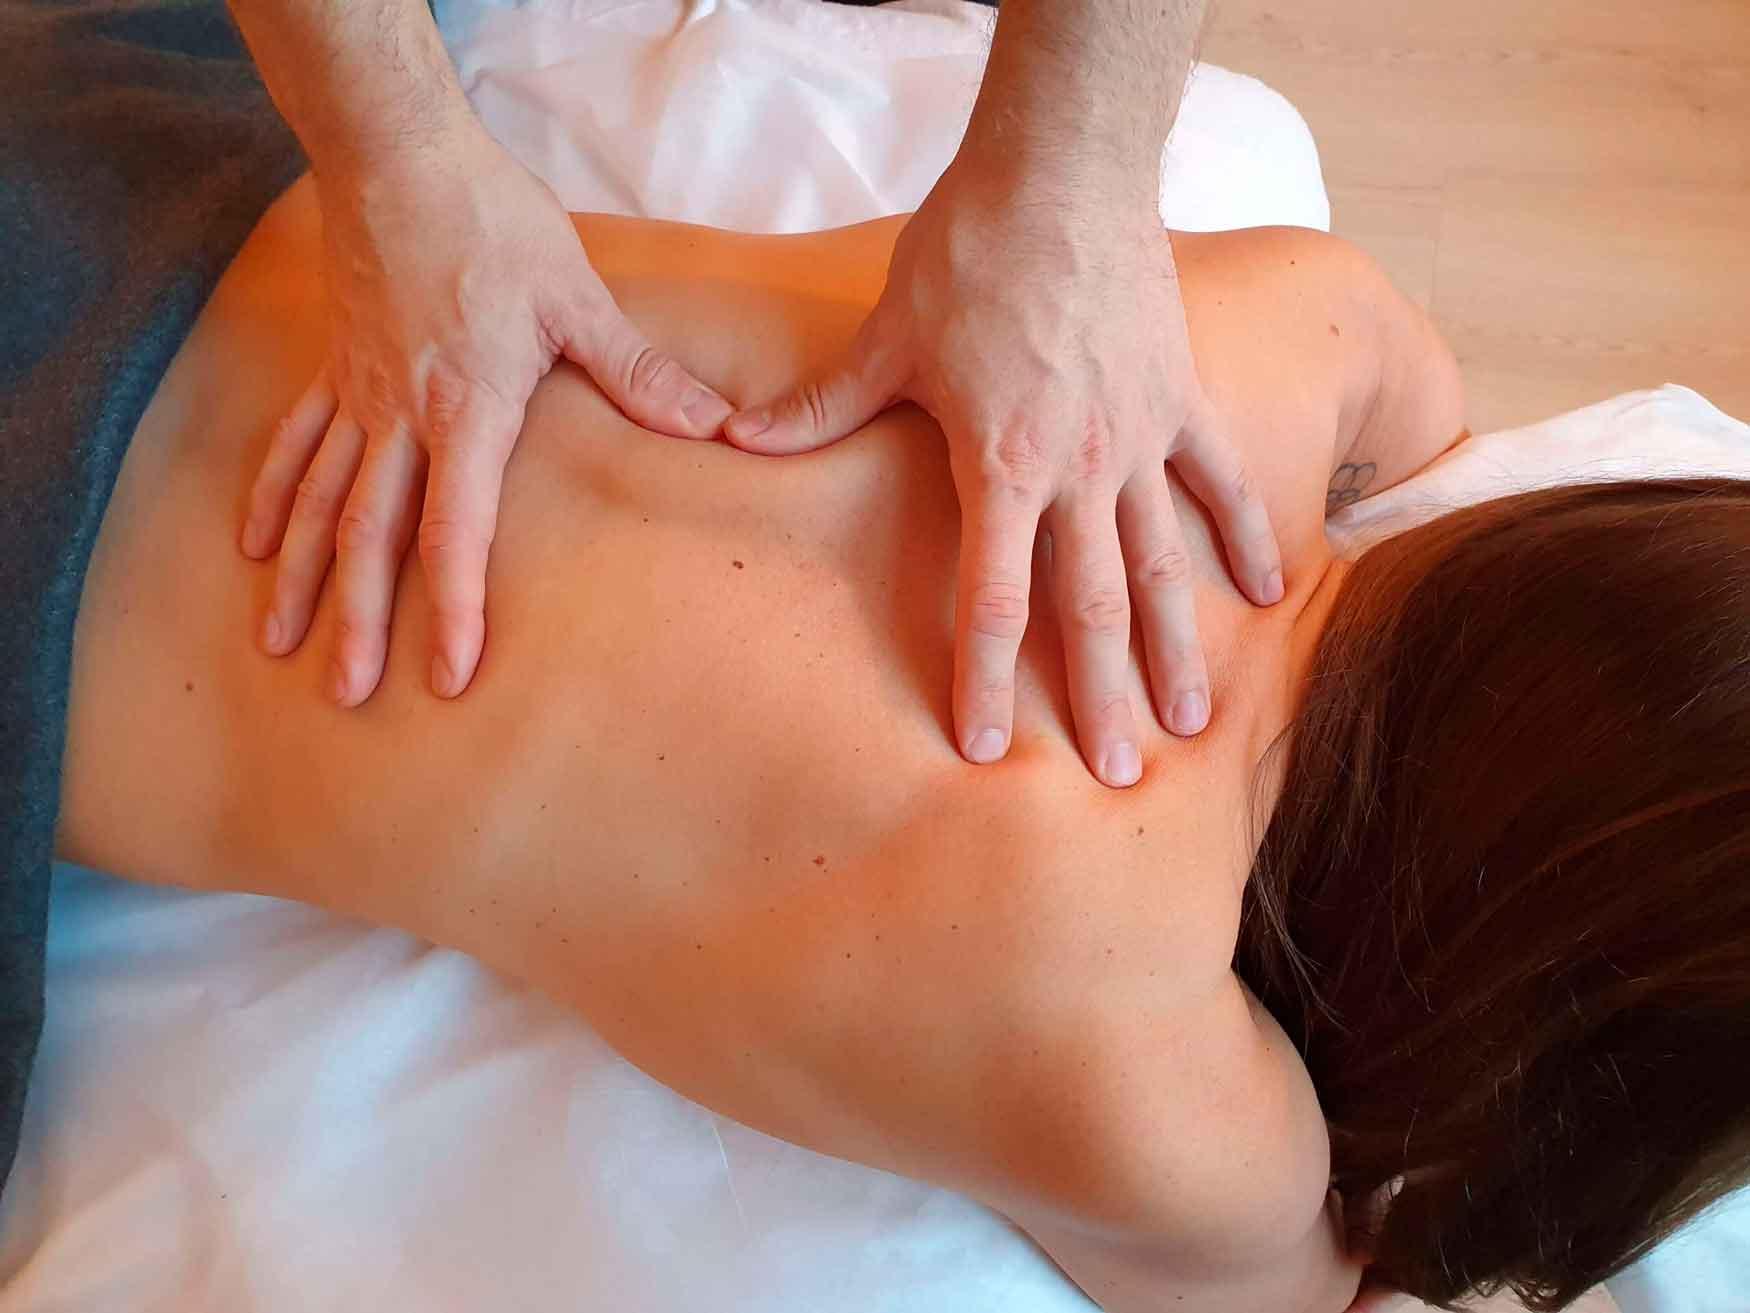 Har du ondt i ryggen så få en effektiv behandling med Body SDS kropsterapi